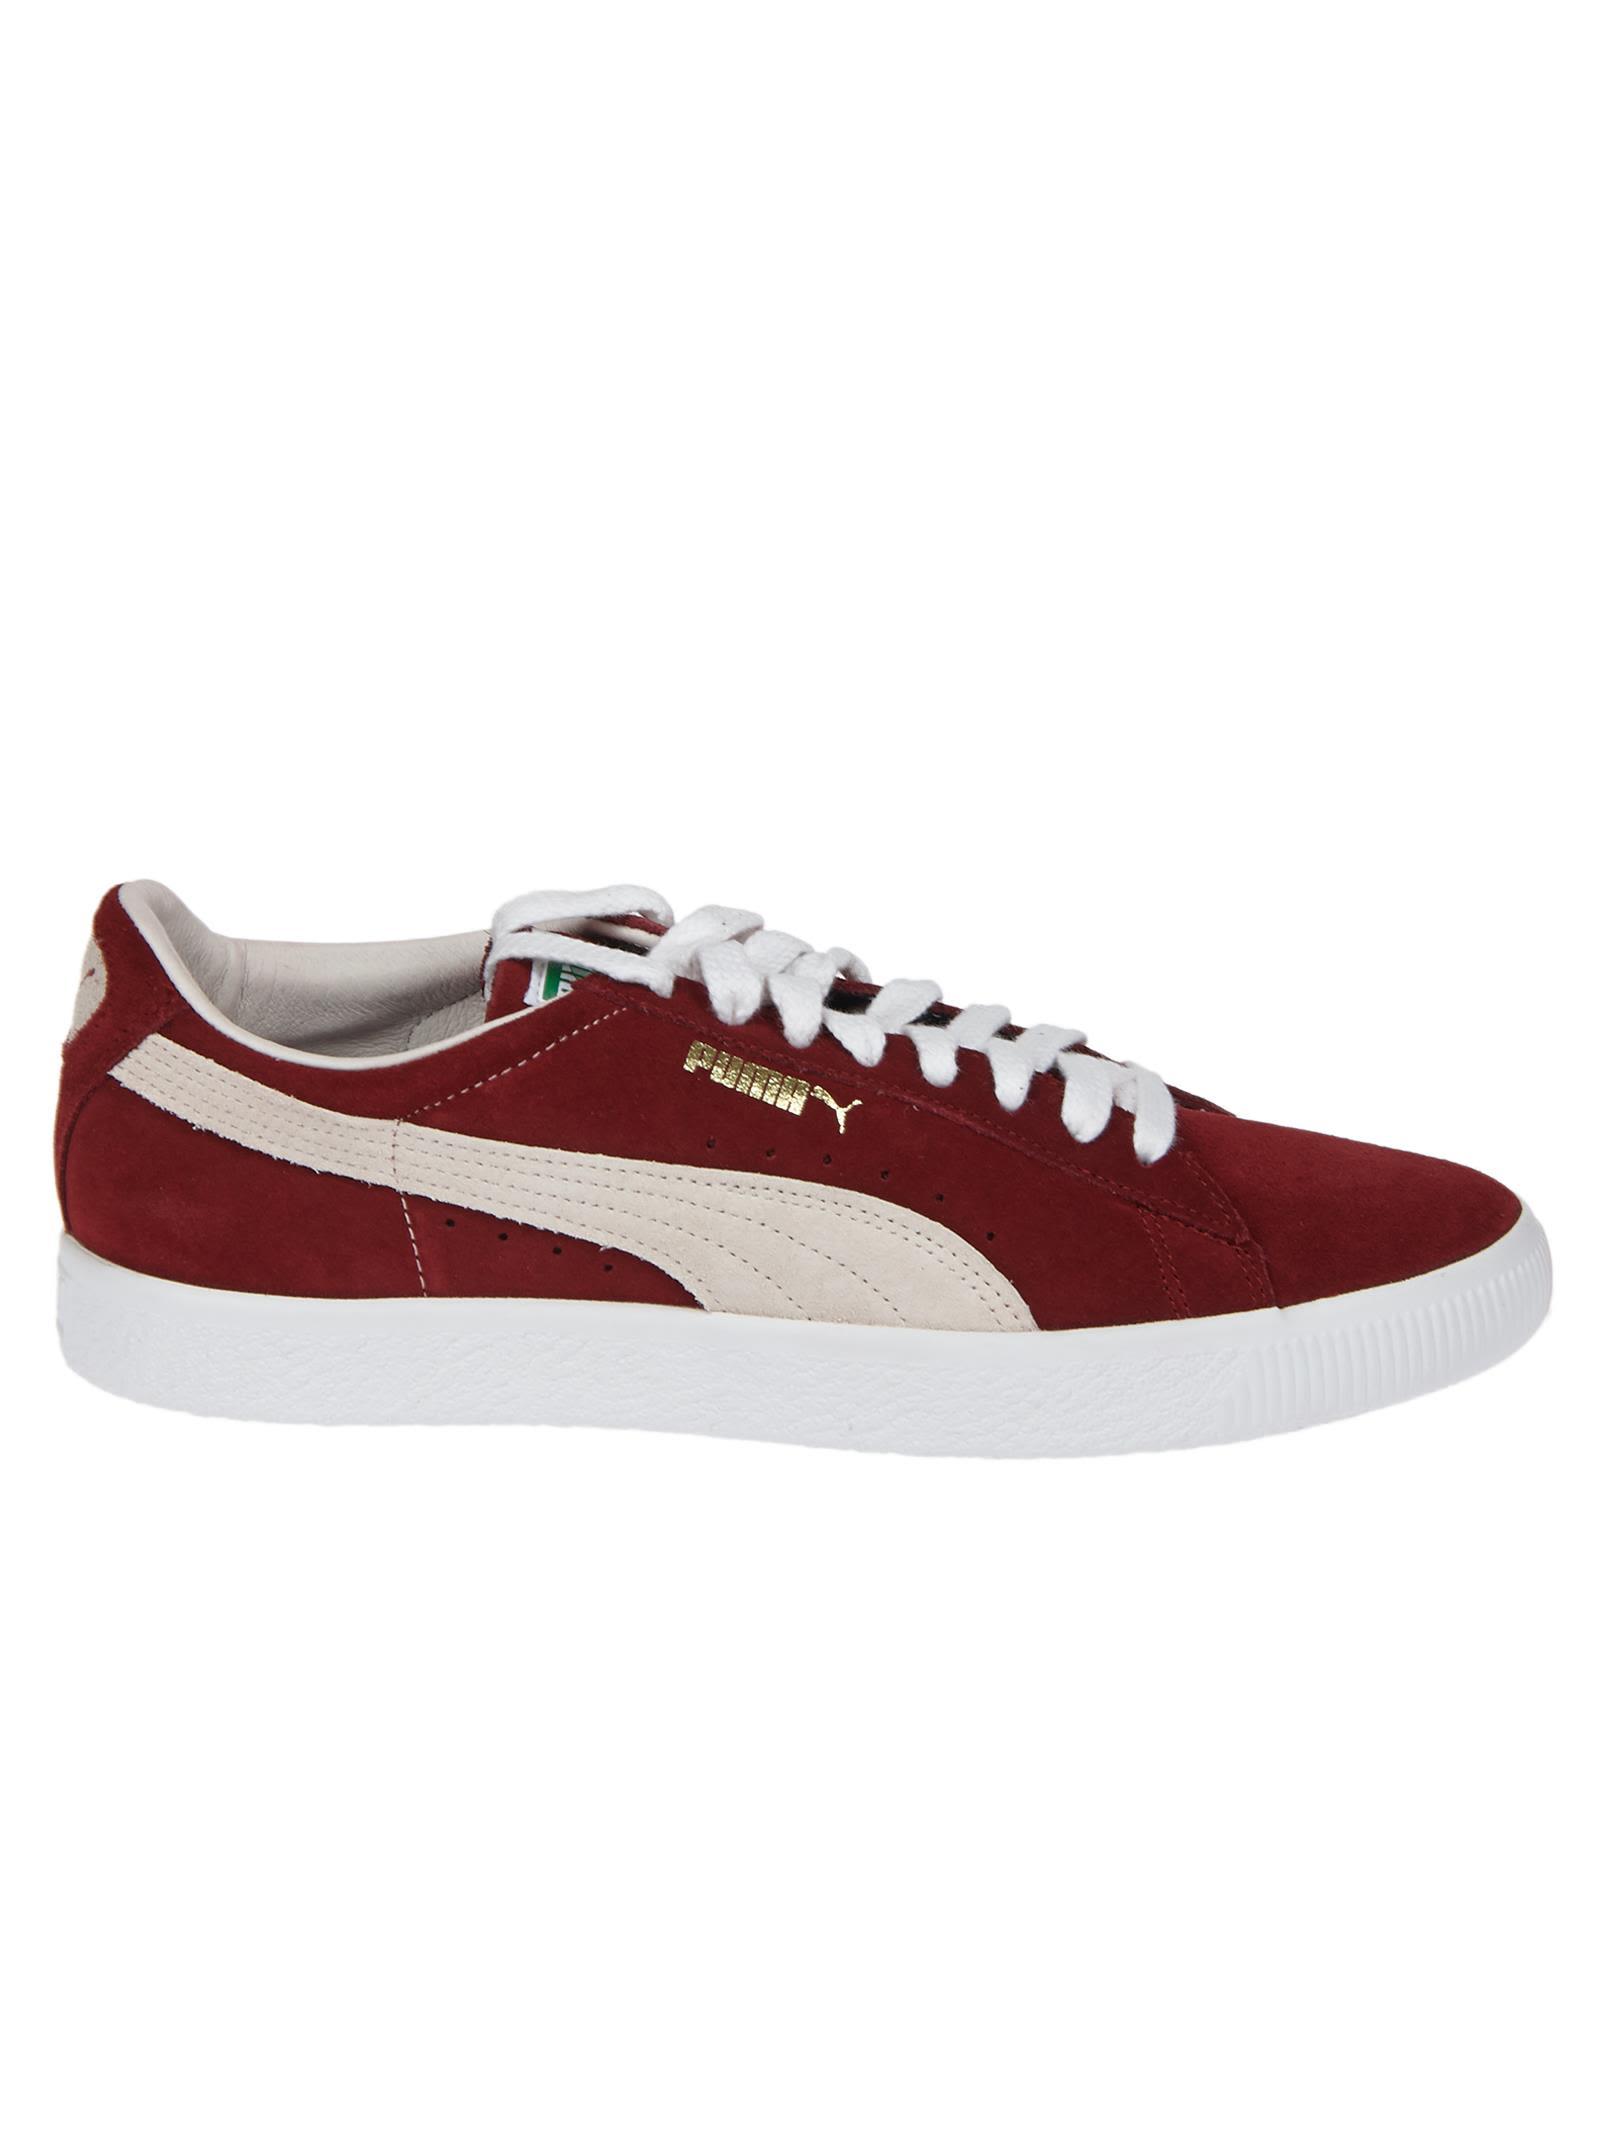 Puma Pomegranate Whisper Sneakers